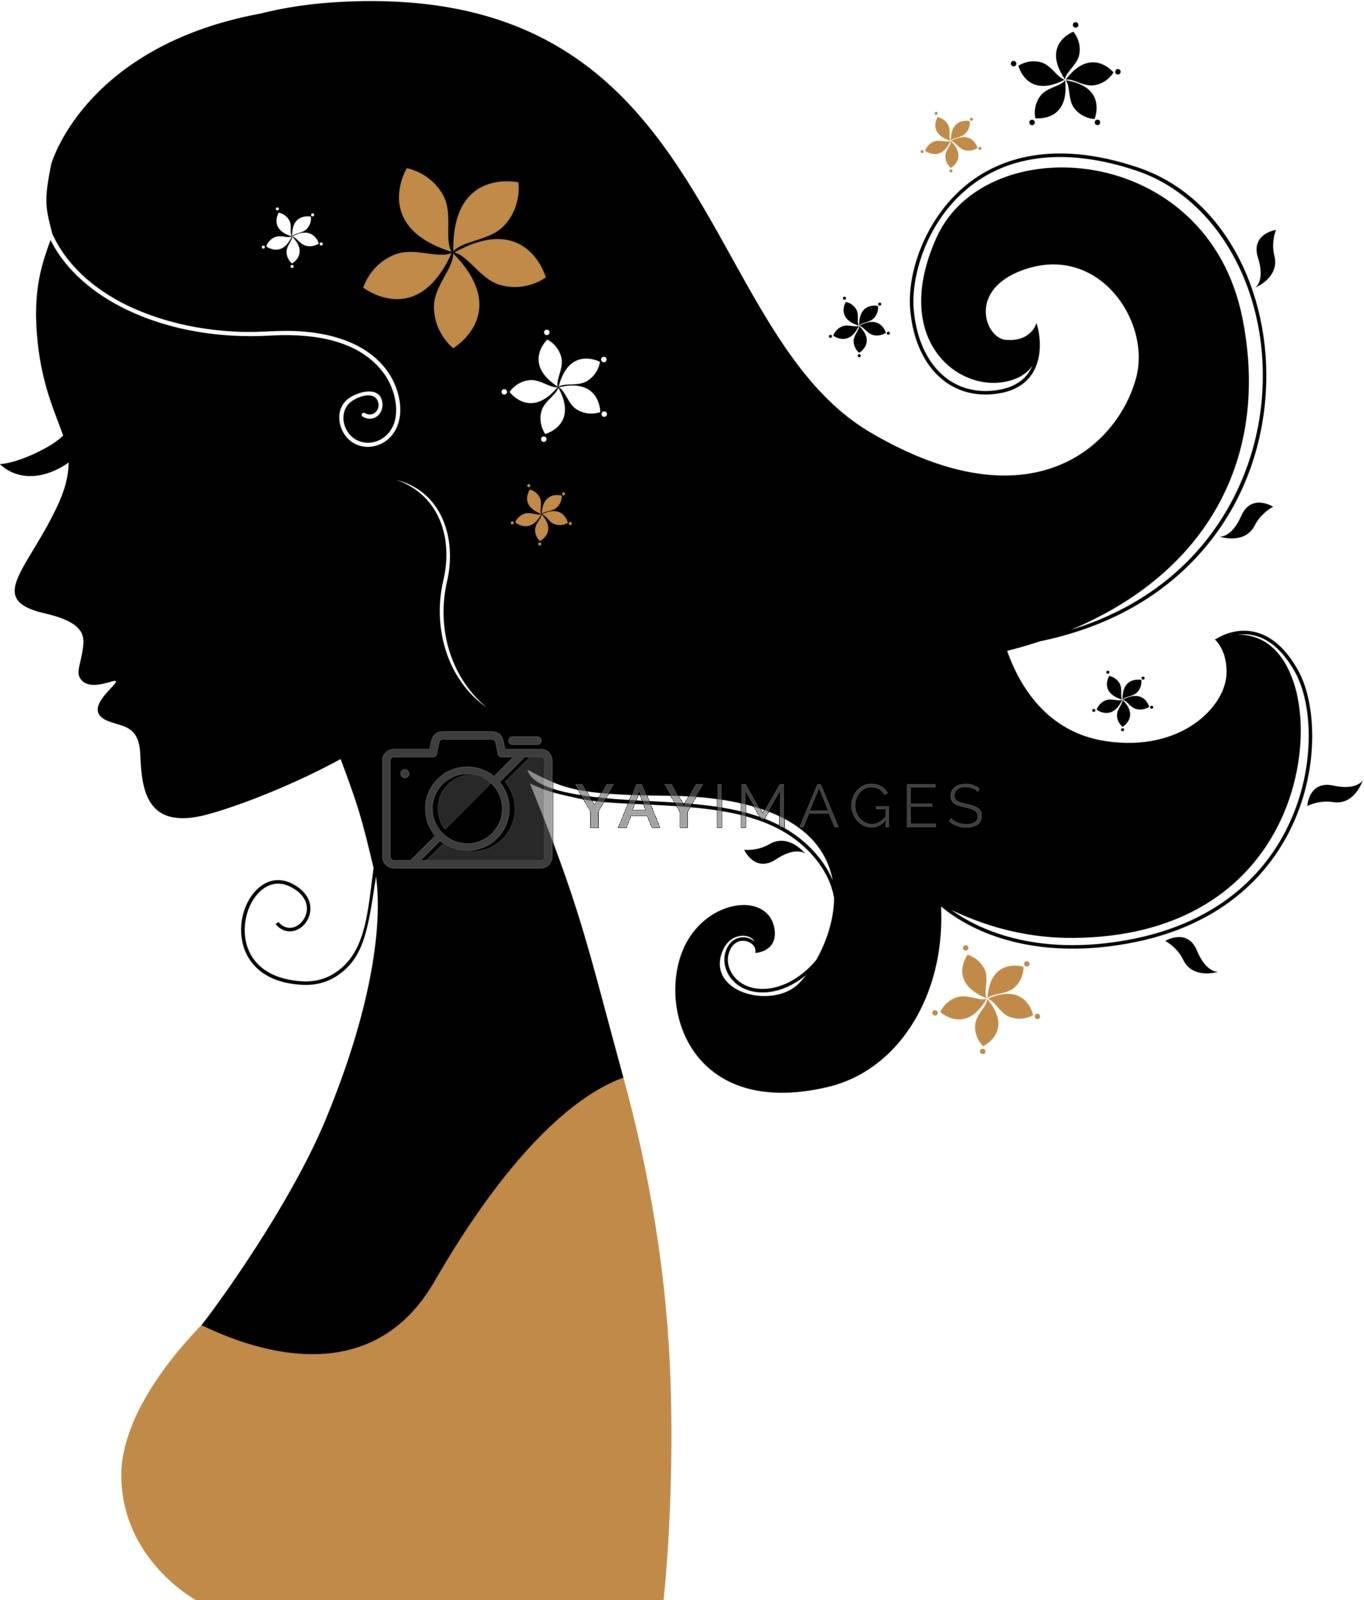 Vintage woman silhouette. Vector Illustration